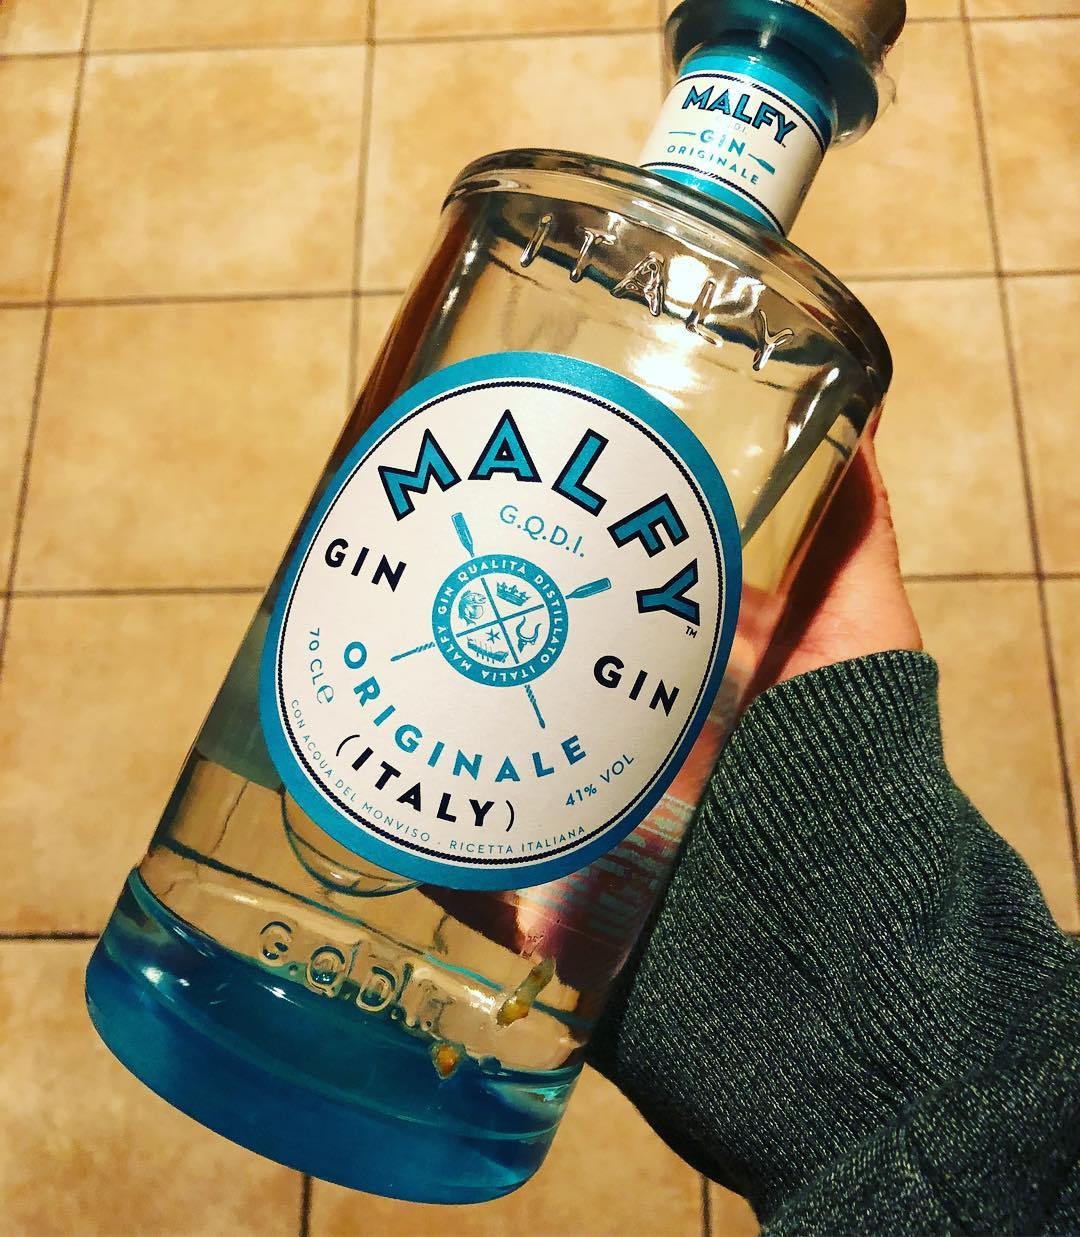 Malfy Originale – First Impressions